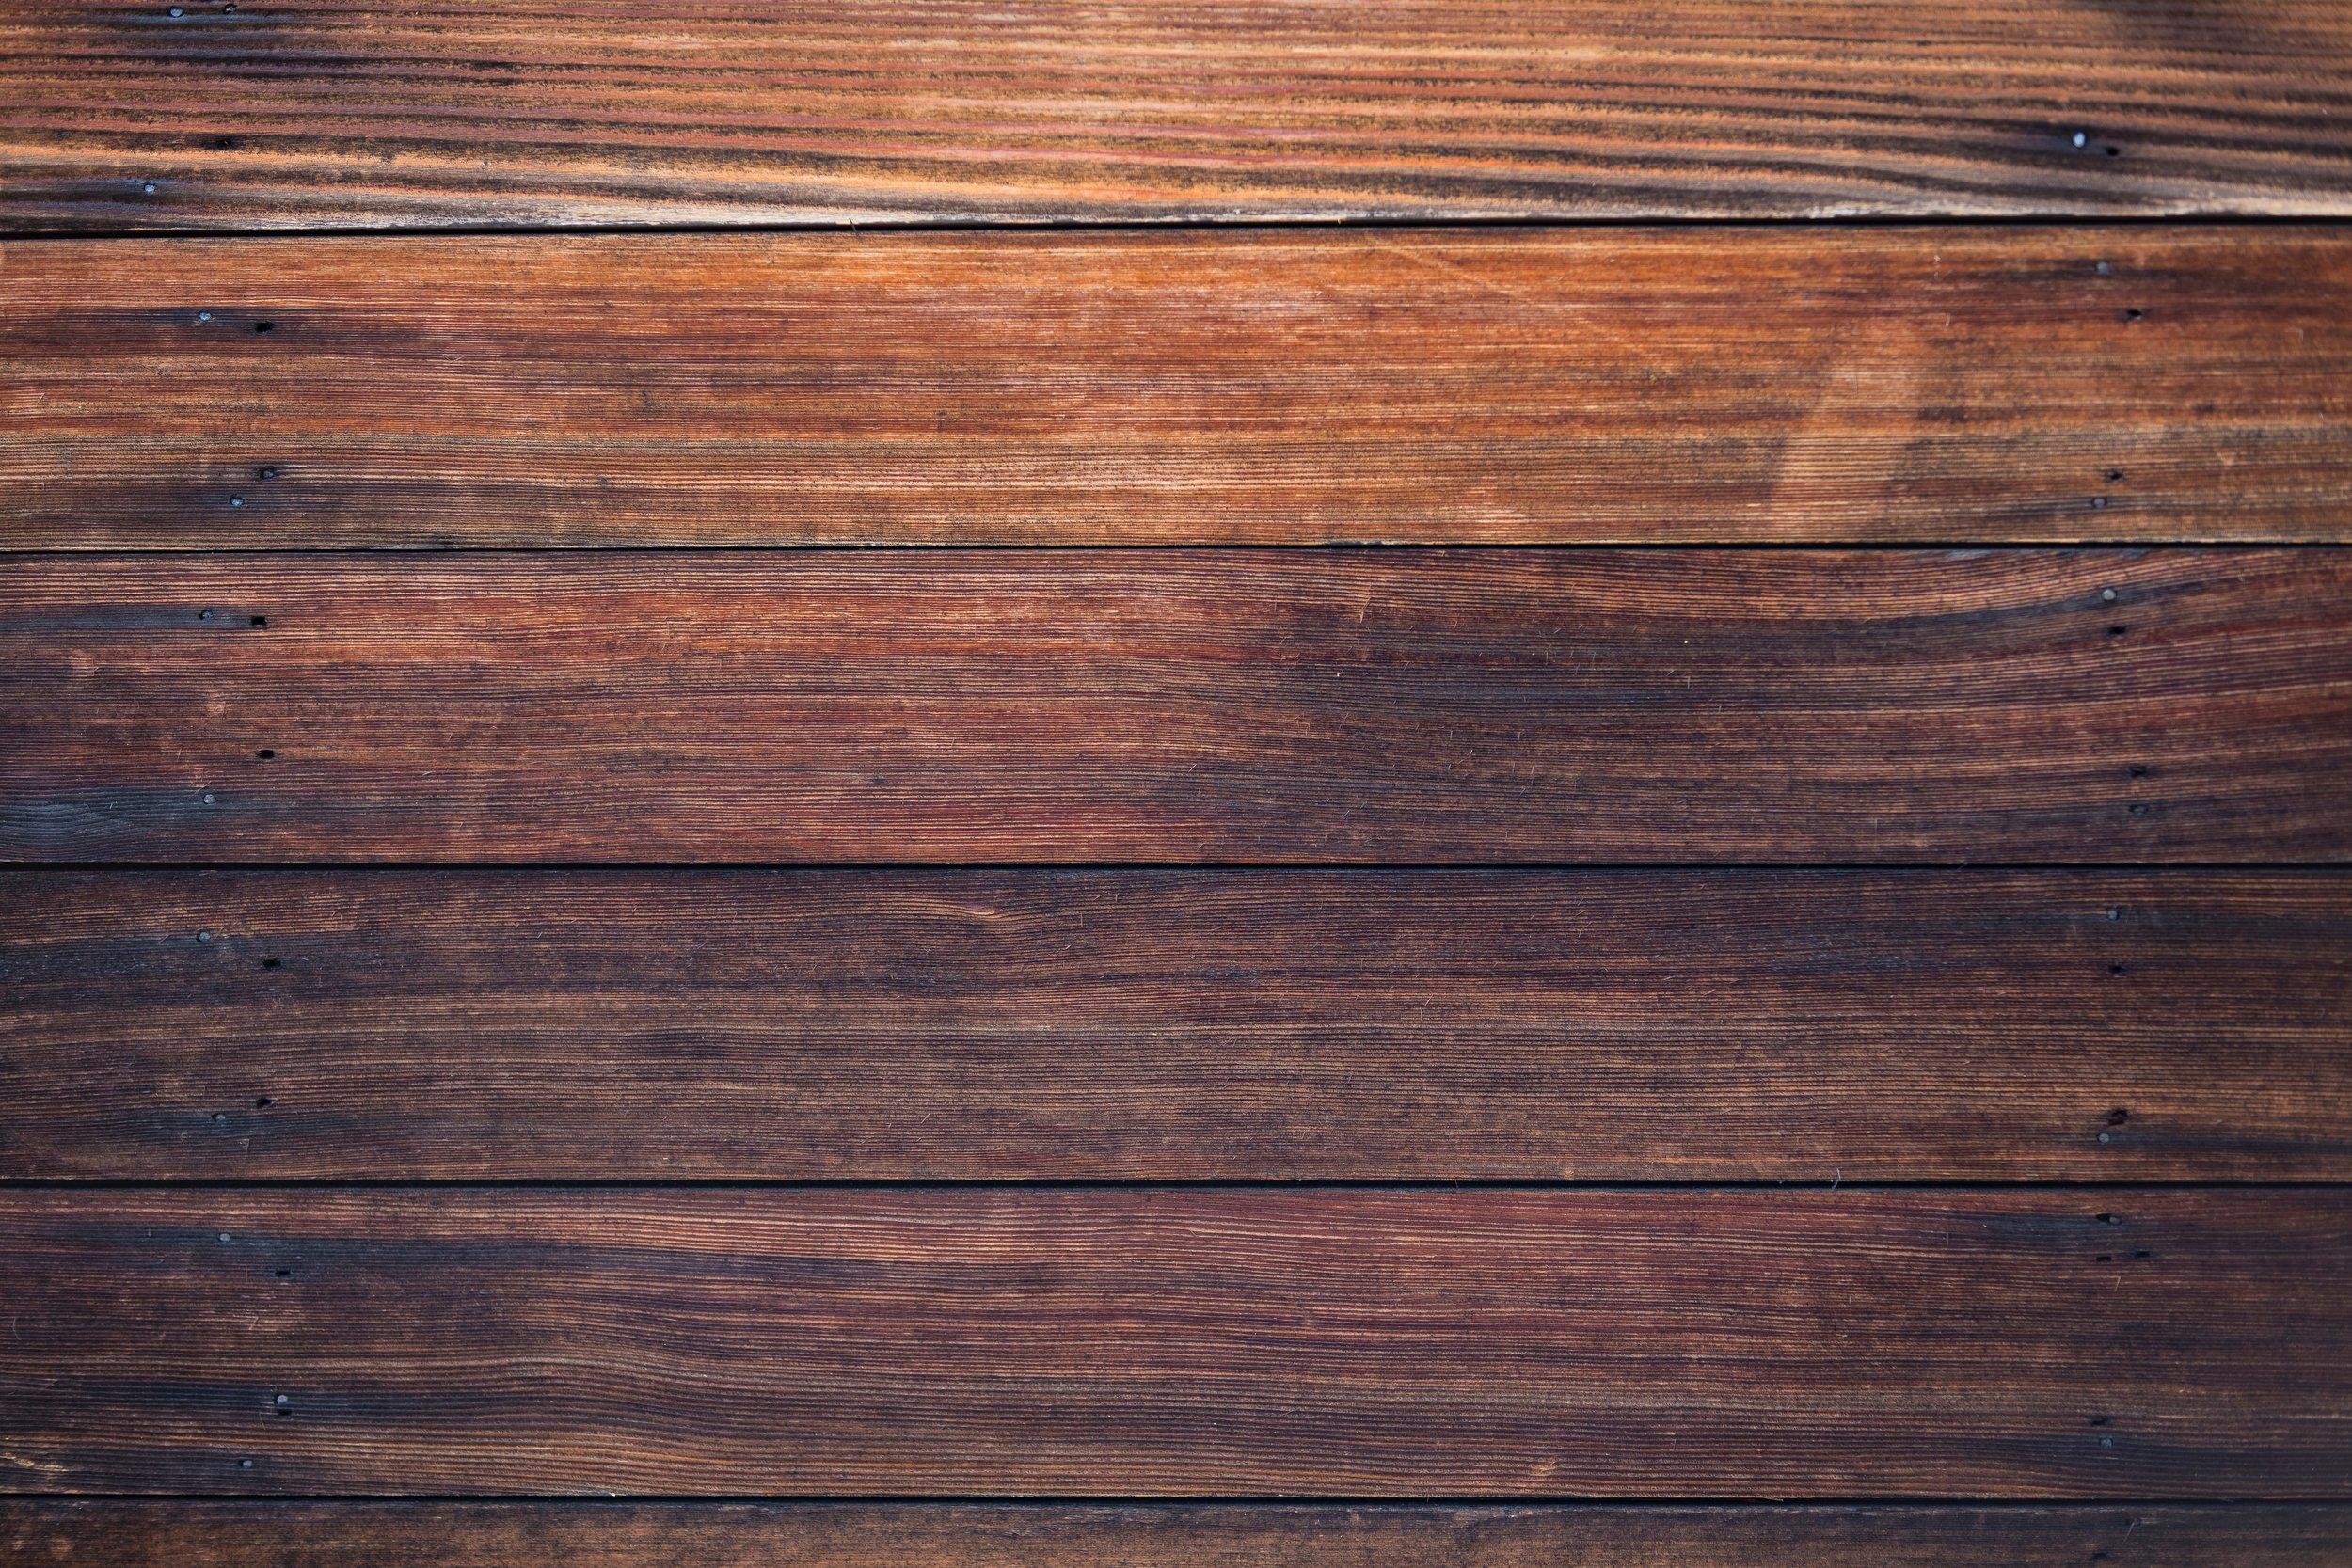 siding-Maple-Grove-exteriors-contractor.jpg